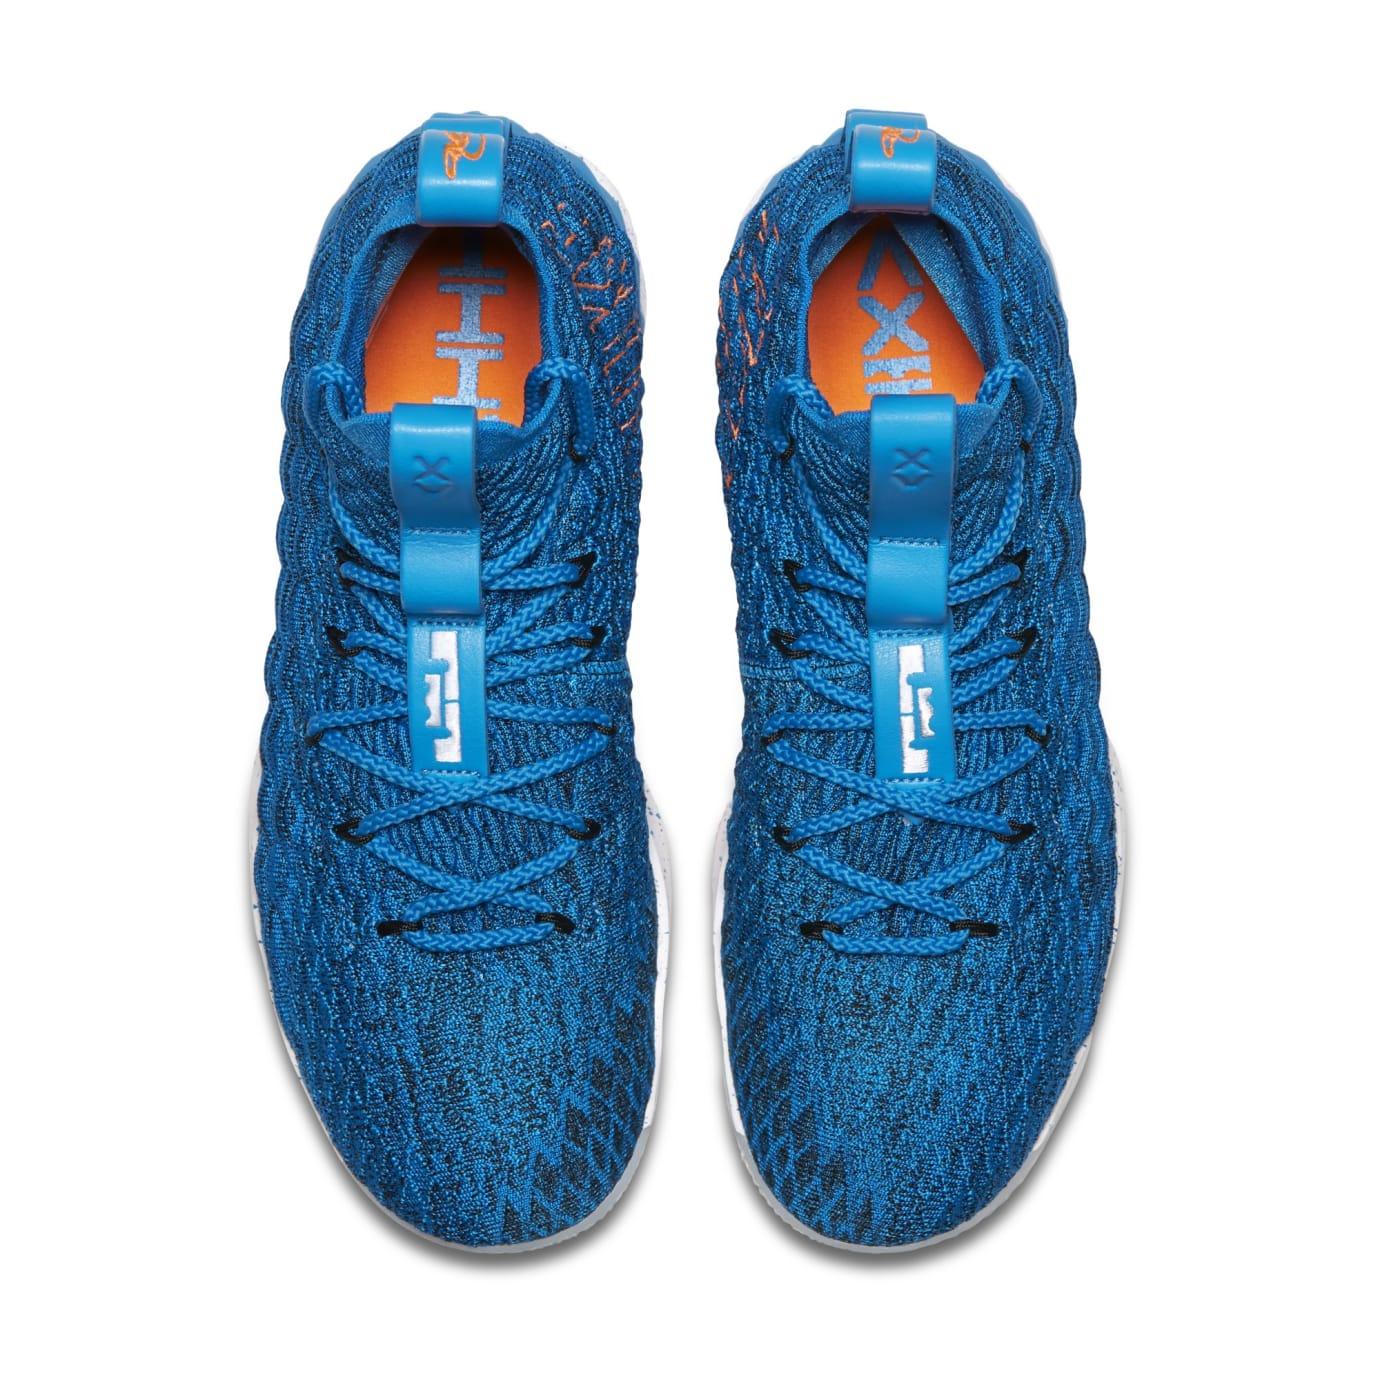 79942e8ab684 Image via Nike Nike LeBron 15  HWC  897648-400 (Top)